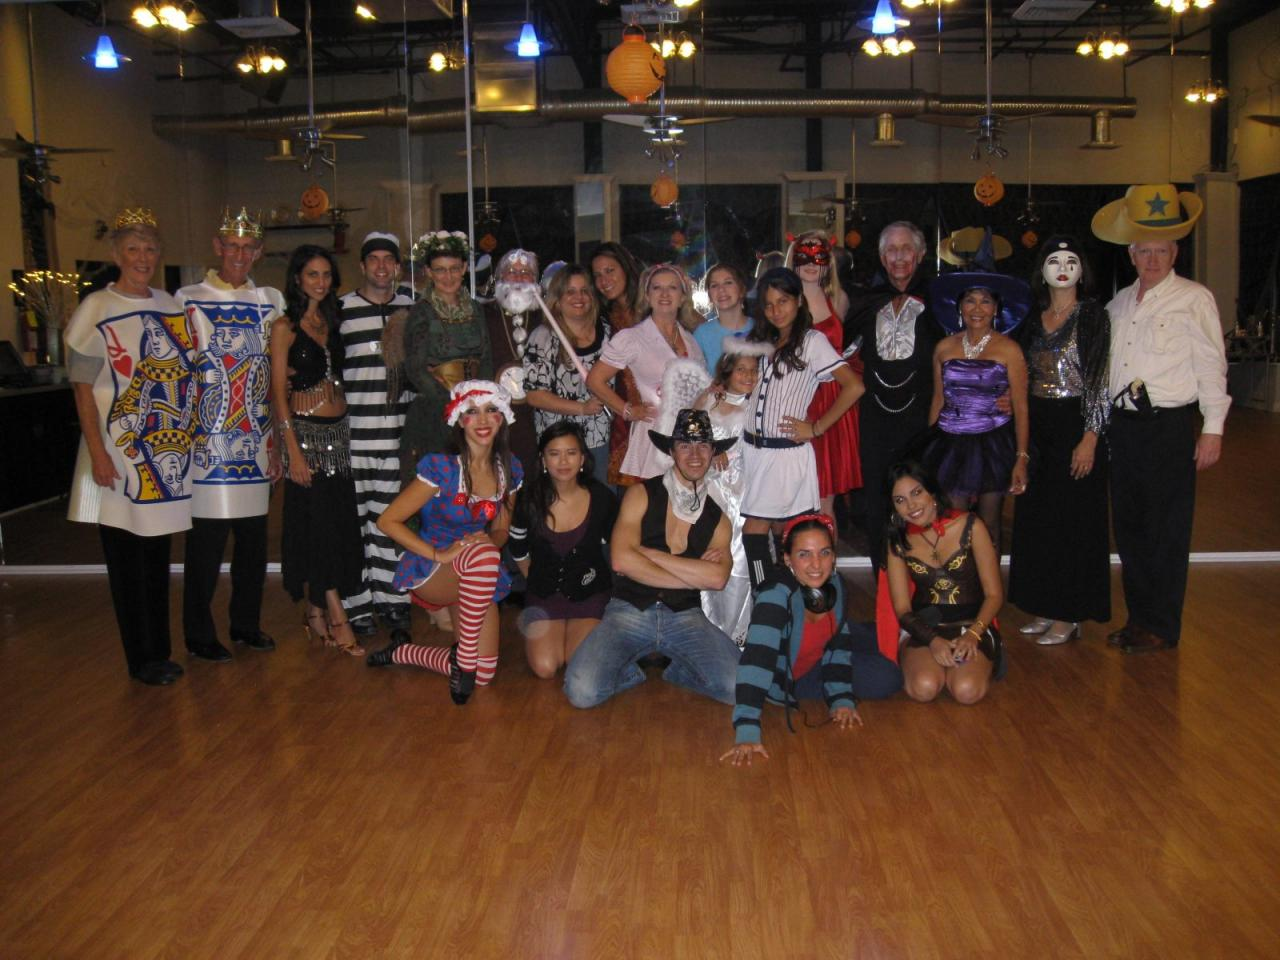 Dance Center USA image 24